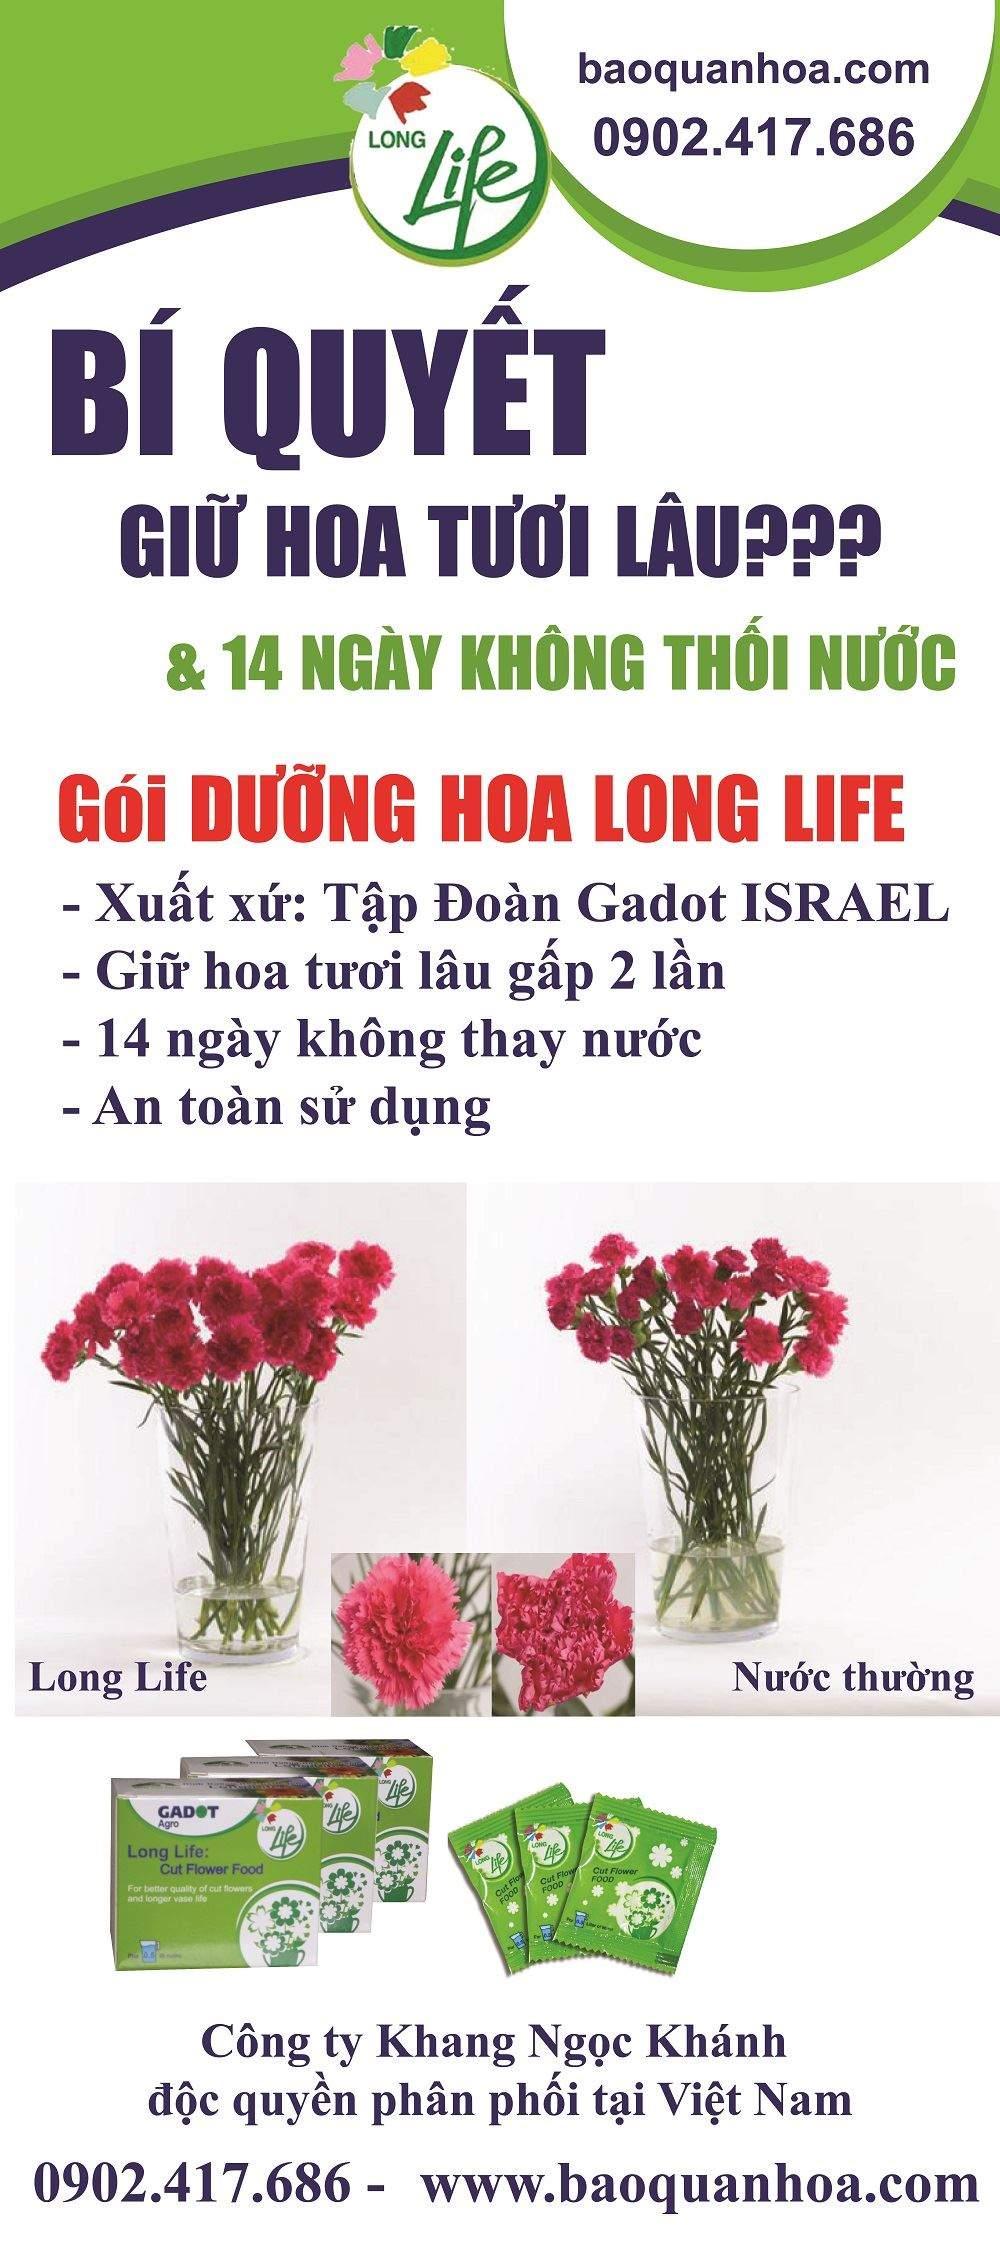 dinh-duong-hoa-long-life